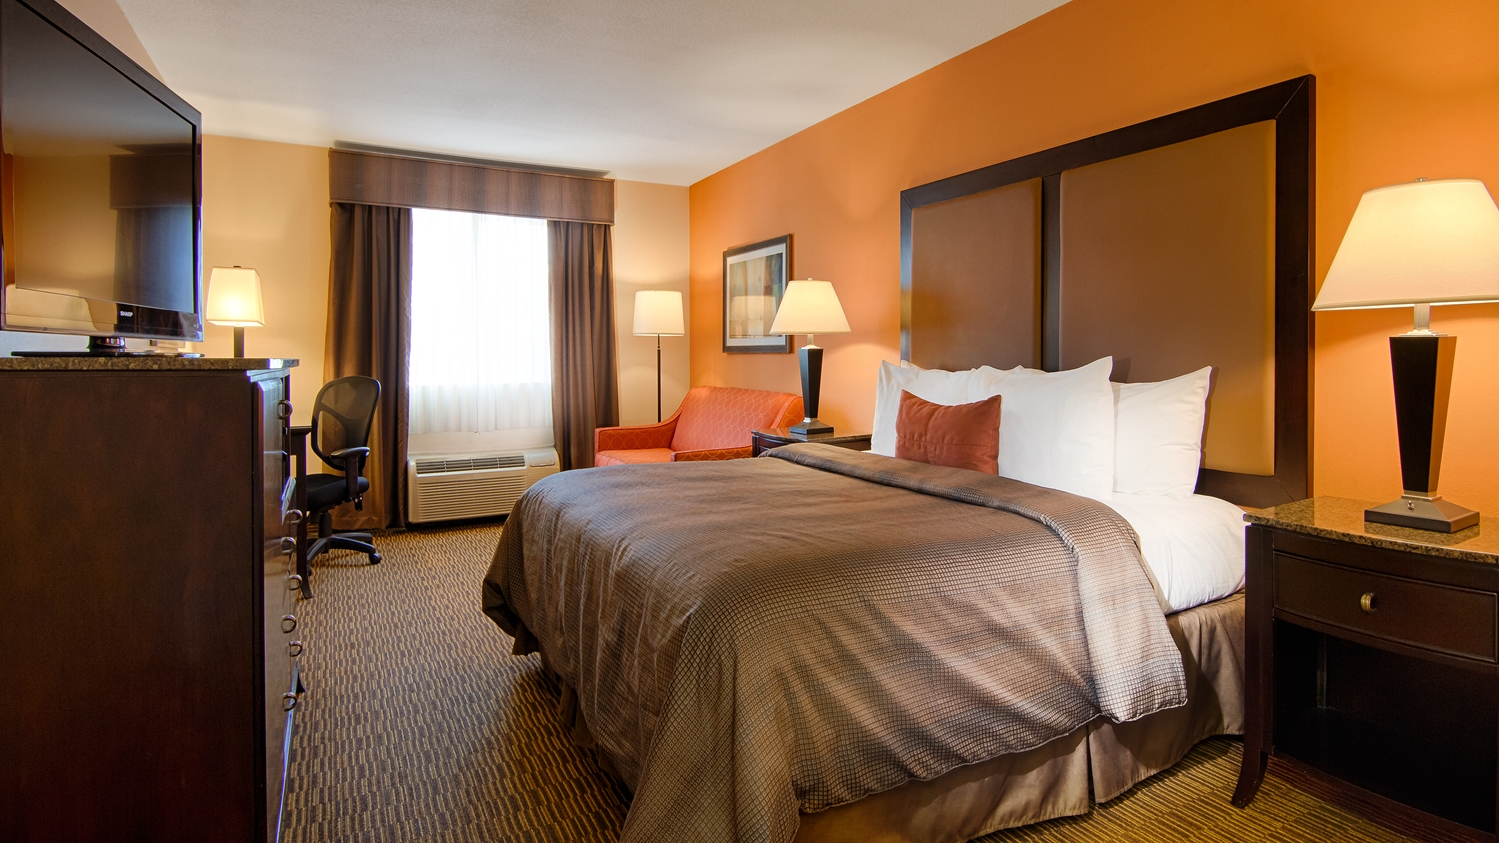 Best Western Plus Vineyard Inn Livermore, CA - See Discounts